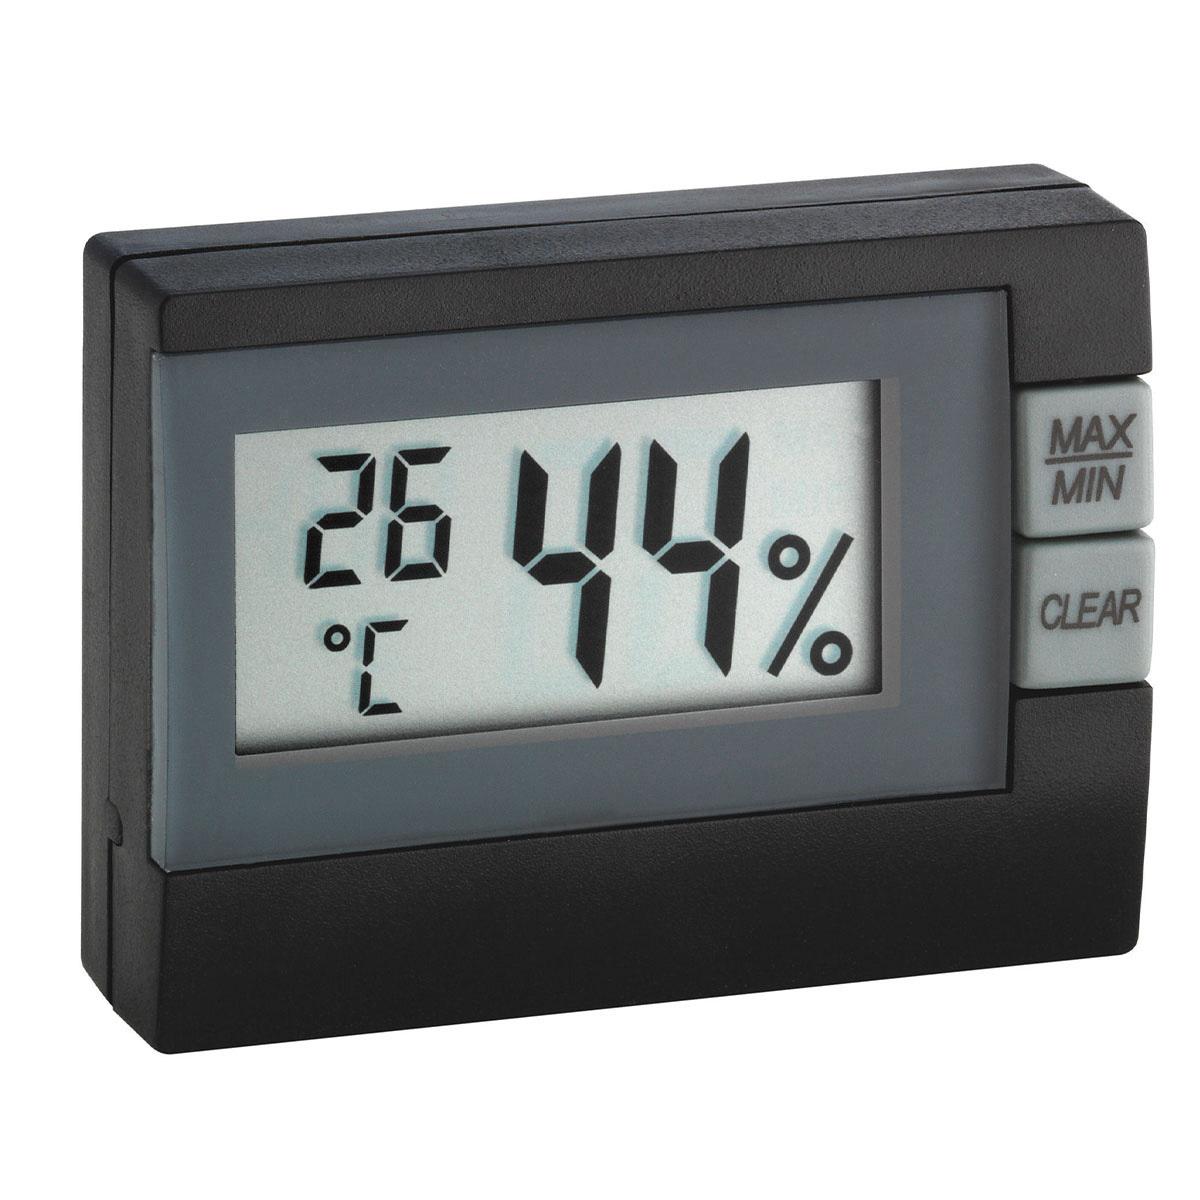 30-5005-01-digitales-thermo-hygrometer-1200x1200px.jpg